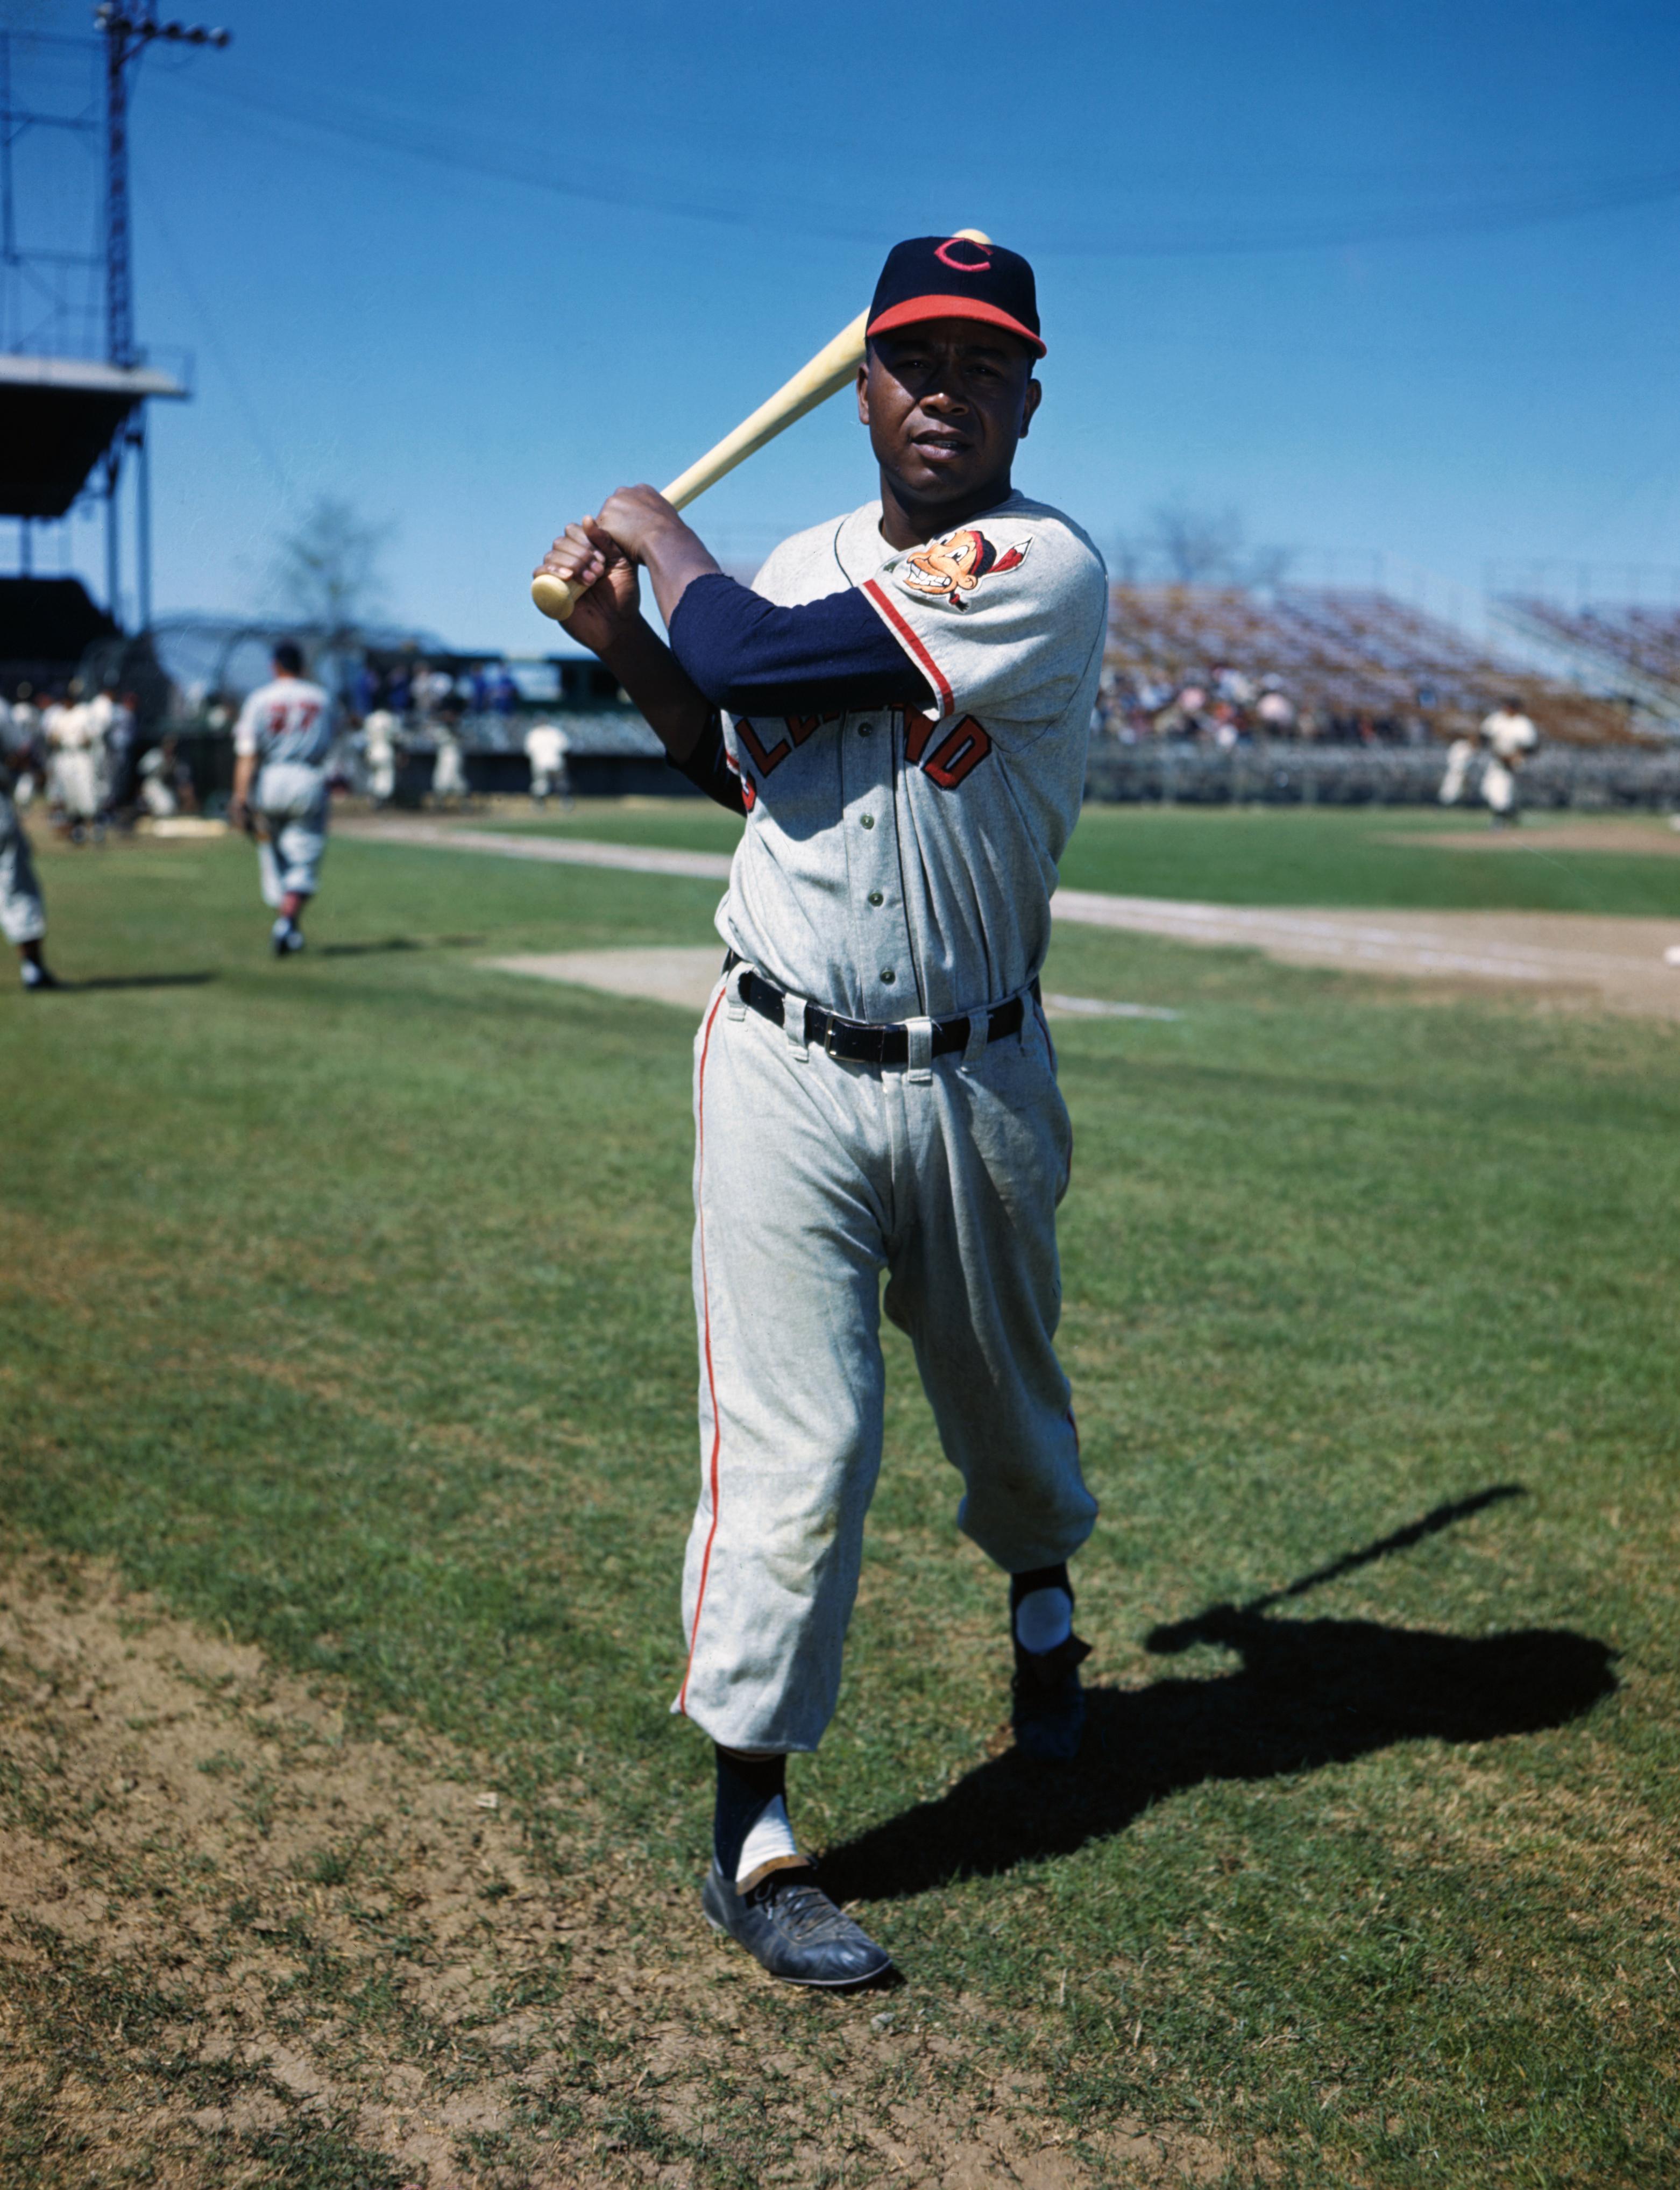 Larry Doby Posing with Baseball Bat